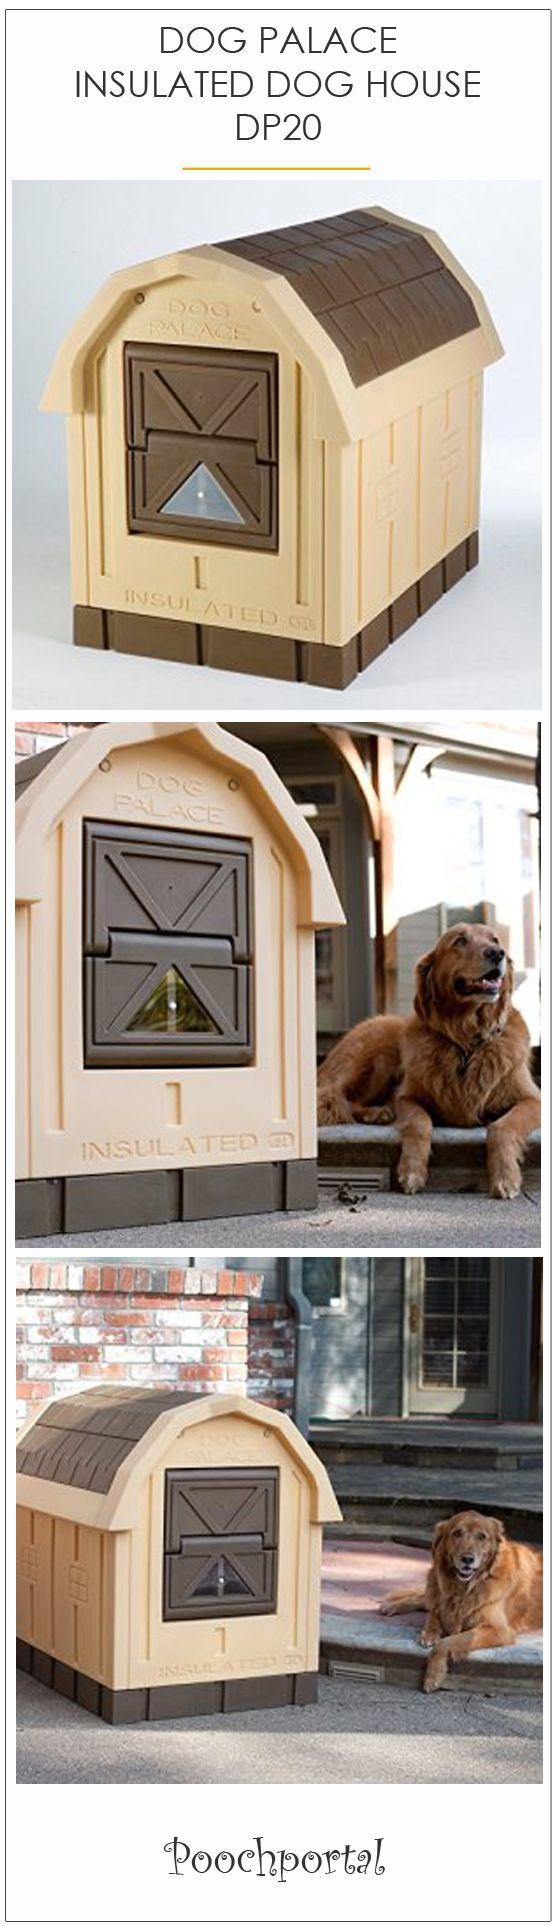 DOG PALACE INSULATED PLASTIC DOG HOUSE DP20